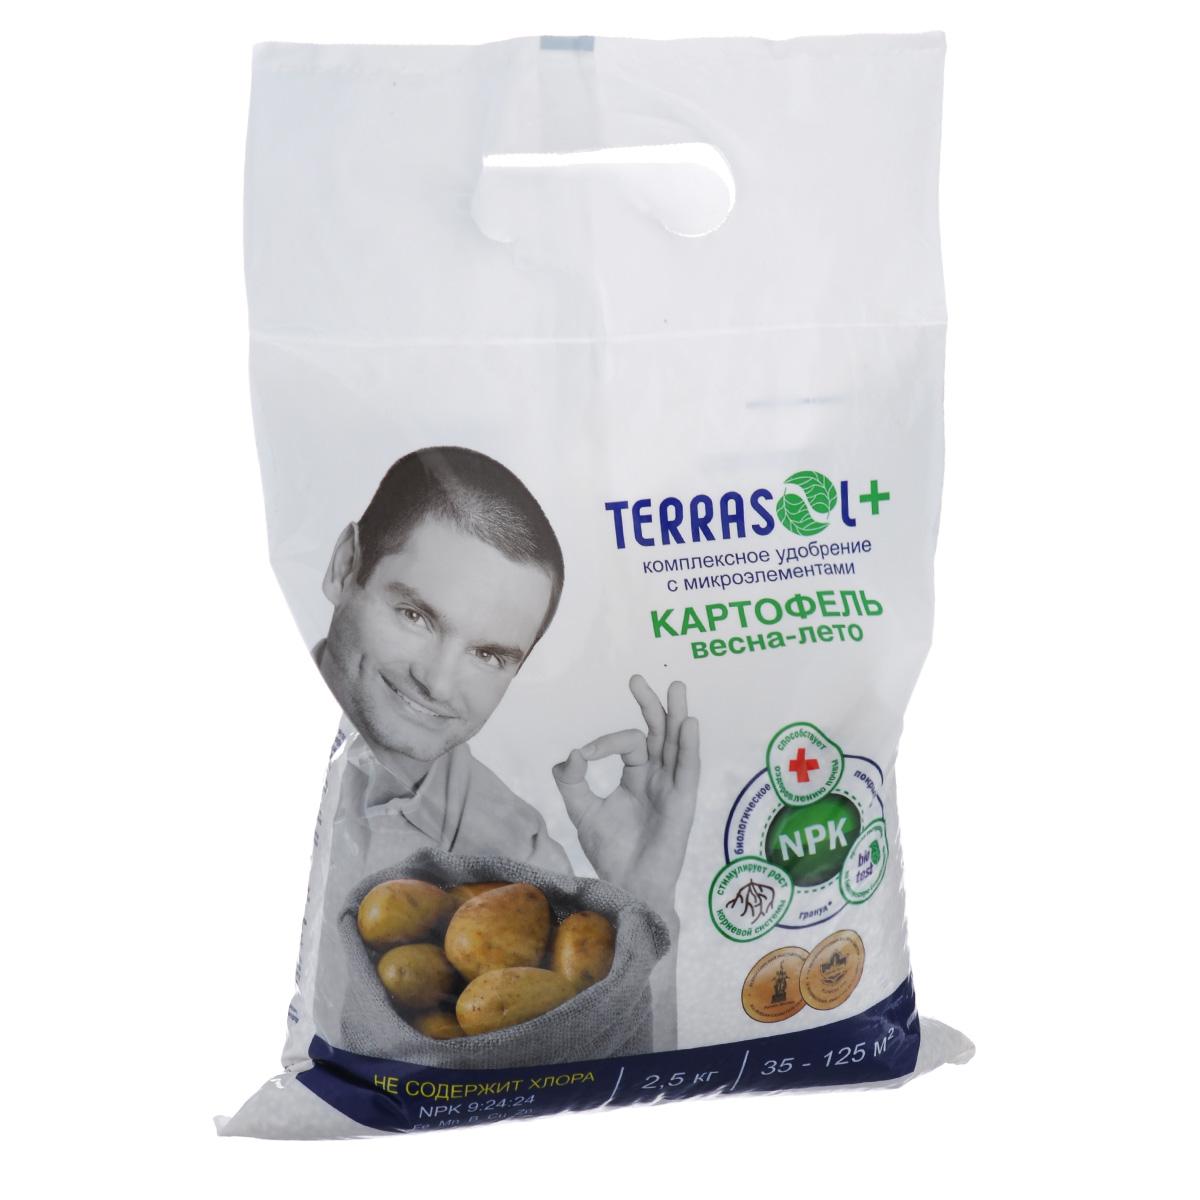 ��������� ����������� ����� TerraSol+, ��� ���������, � ��������, 2,5 �� - TerraSol+Of000007657��������� ����������� ����� ��������� TerraSol+ (���������) � ��������������� �������� ��� ����������� ���������. �������� ����������� ��������� ��������� ������� ����������� �������� ���� � ������� ������, �������� �������� ��������. �������� ������������ ���, ������ ��� ���������. ������� ����� ������������� �������� - �������� ������������������ ���������� �� ������ ����������� �������� Bacillus subtilis (����������). ���������� - ��� ����� ���������� �� ��������� ������������ ����, ���������� �� ��������, ������������ �������� ���������������, �� ����������� ������. � ����� ������� ��������� ��������������� ������ ��� ����� � ����������� ���� ��������. ��������, �� ������� ����������� TerraSol, �������� ������� �������� ��������, ��������� ������ � ���� ������� ������. ������� ������������ ��������� ��� ����� � ��������. ������: ���� 9%, ������ 24%, ����� 24%, ������ 0,1%, �������� 0,05%, ��� 0,01%, ���� 0,01%, ���� 0,01%. ����� ��������������.